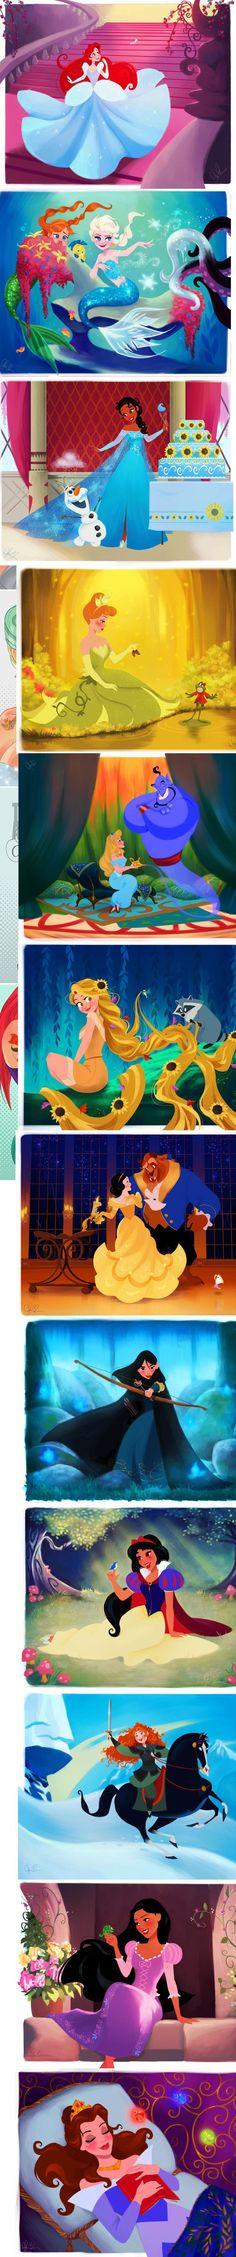 Tiana as Elsa! Cinderella as Tiana! Snow White as Belle! Mulan as Merida! Jasmine as Snow White! Merida as Mulan! Belle as Aurora! Disney Pixar, Walt Disney, Disney Animation, Disney Jokes, Funny Disney Memes, Disney Fan Art, Cute Disney, Disney Dream, Disney Girls